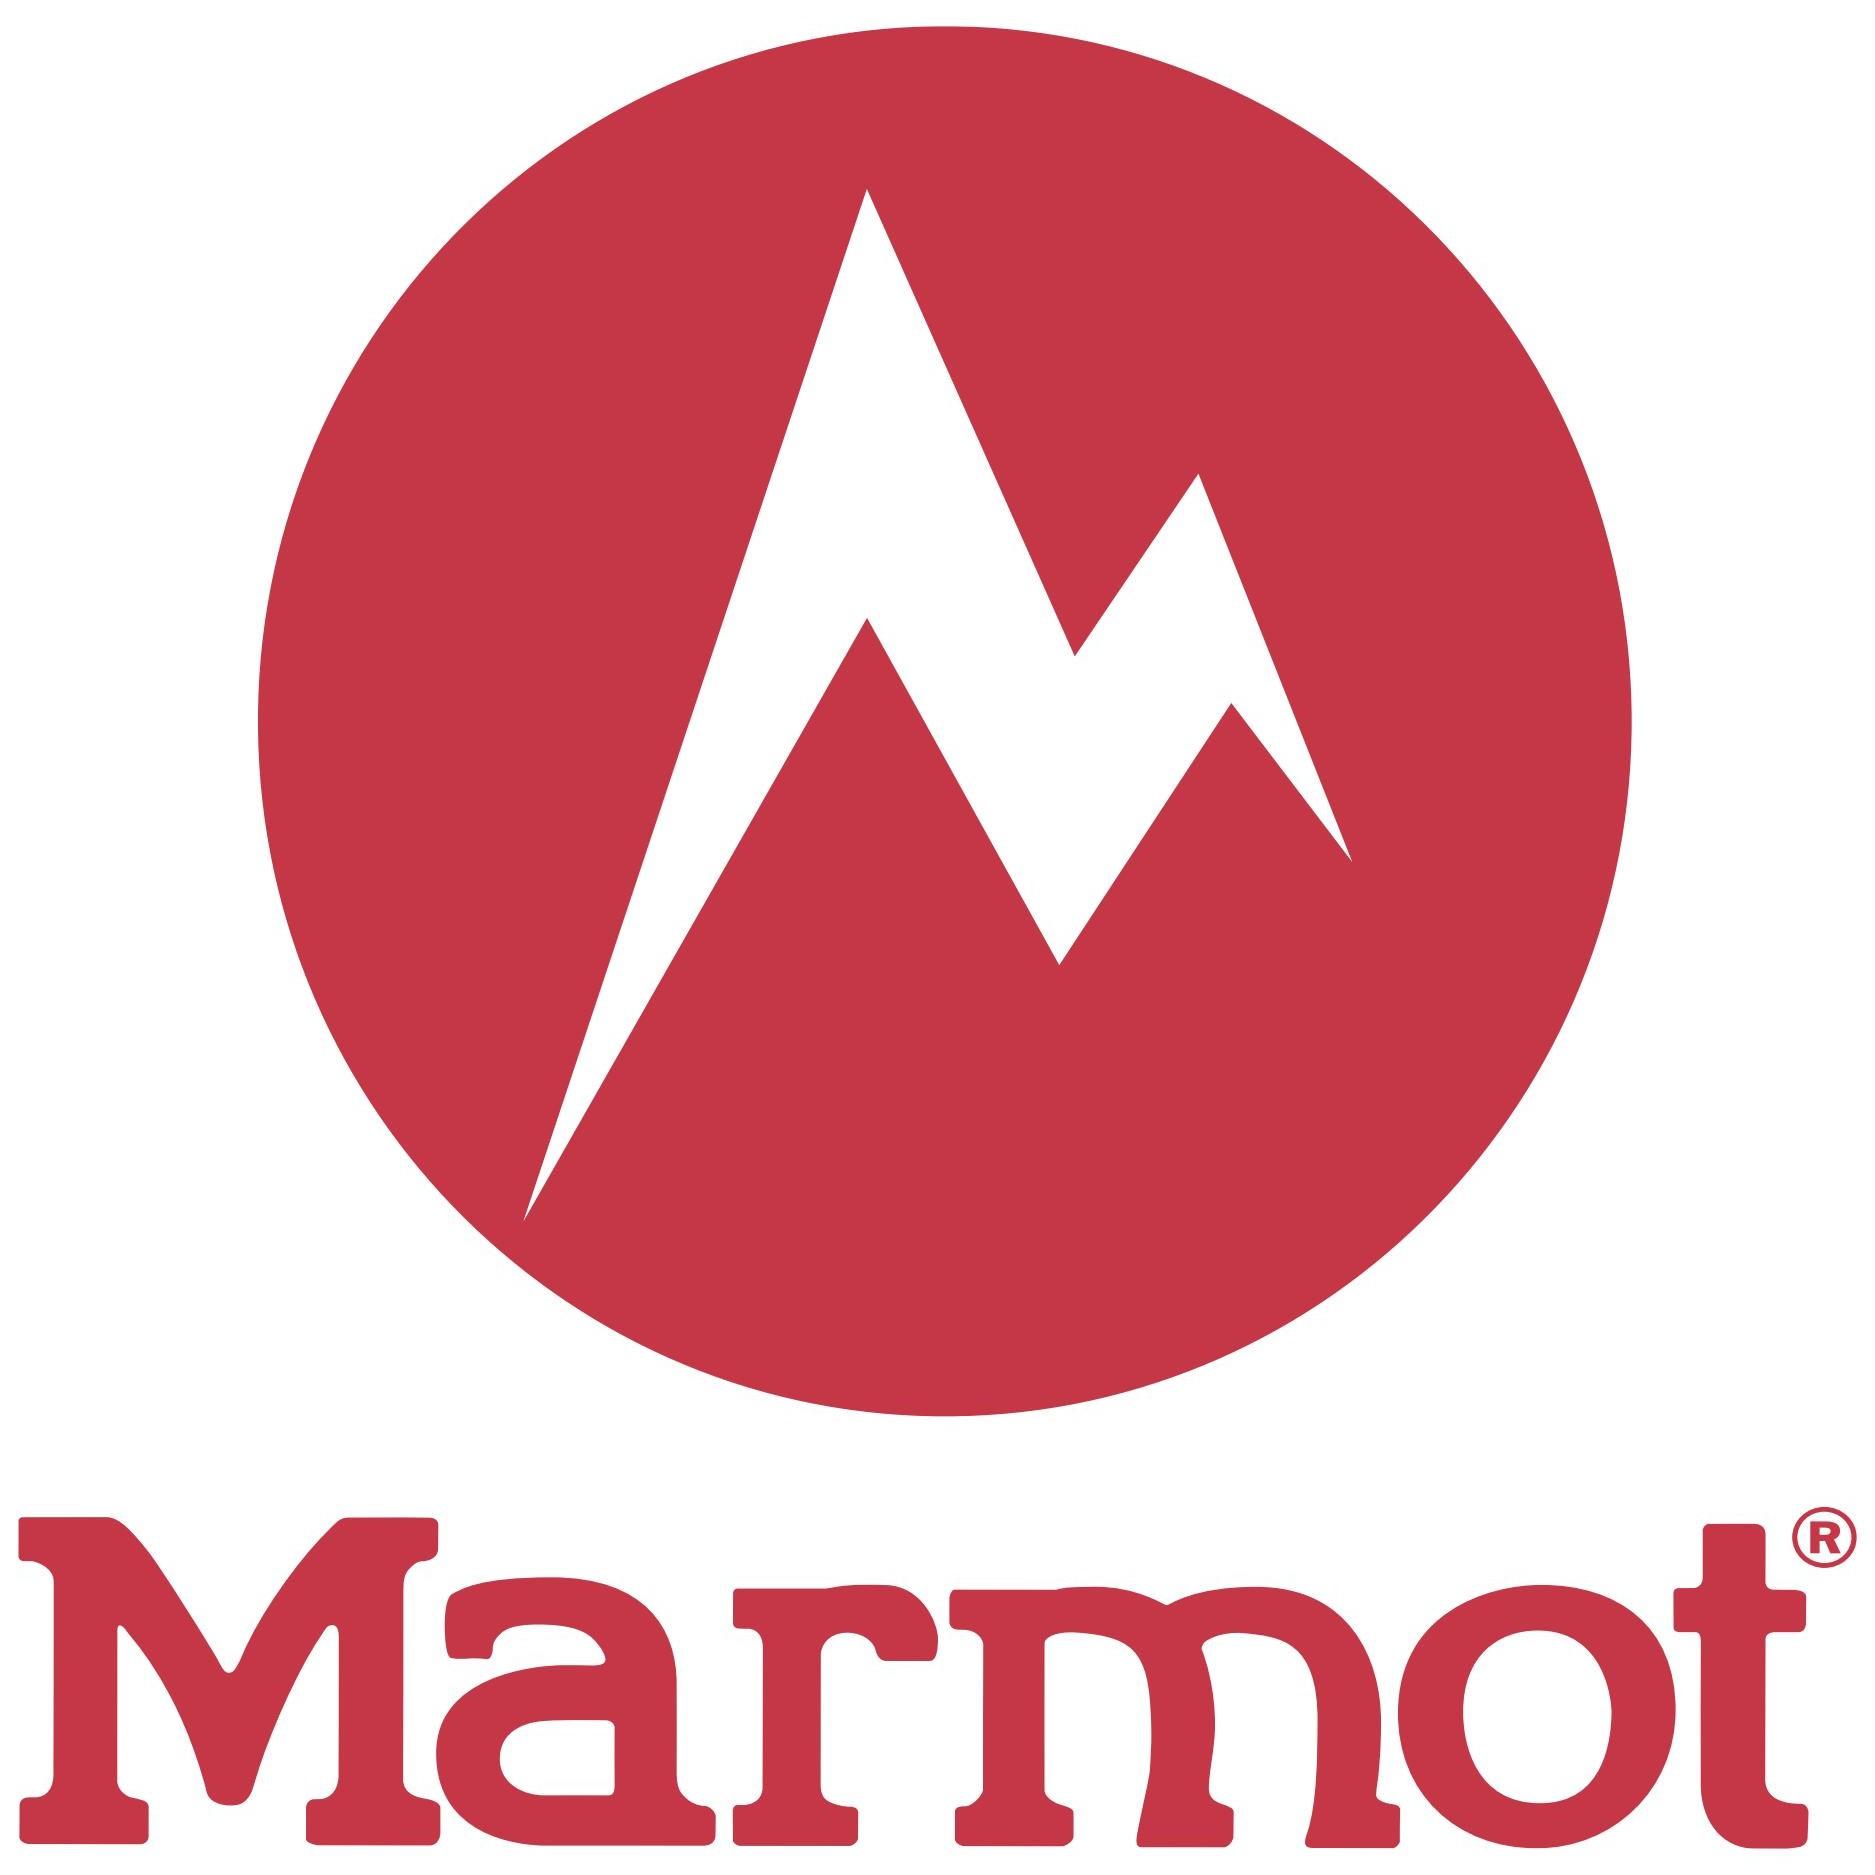 marmot-logo jpeg.jpg